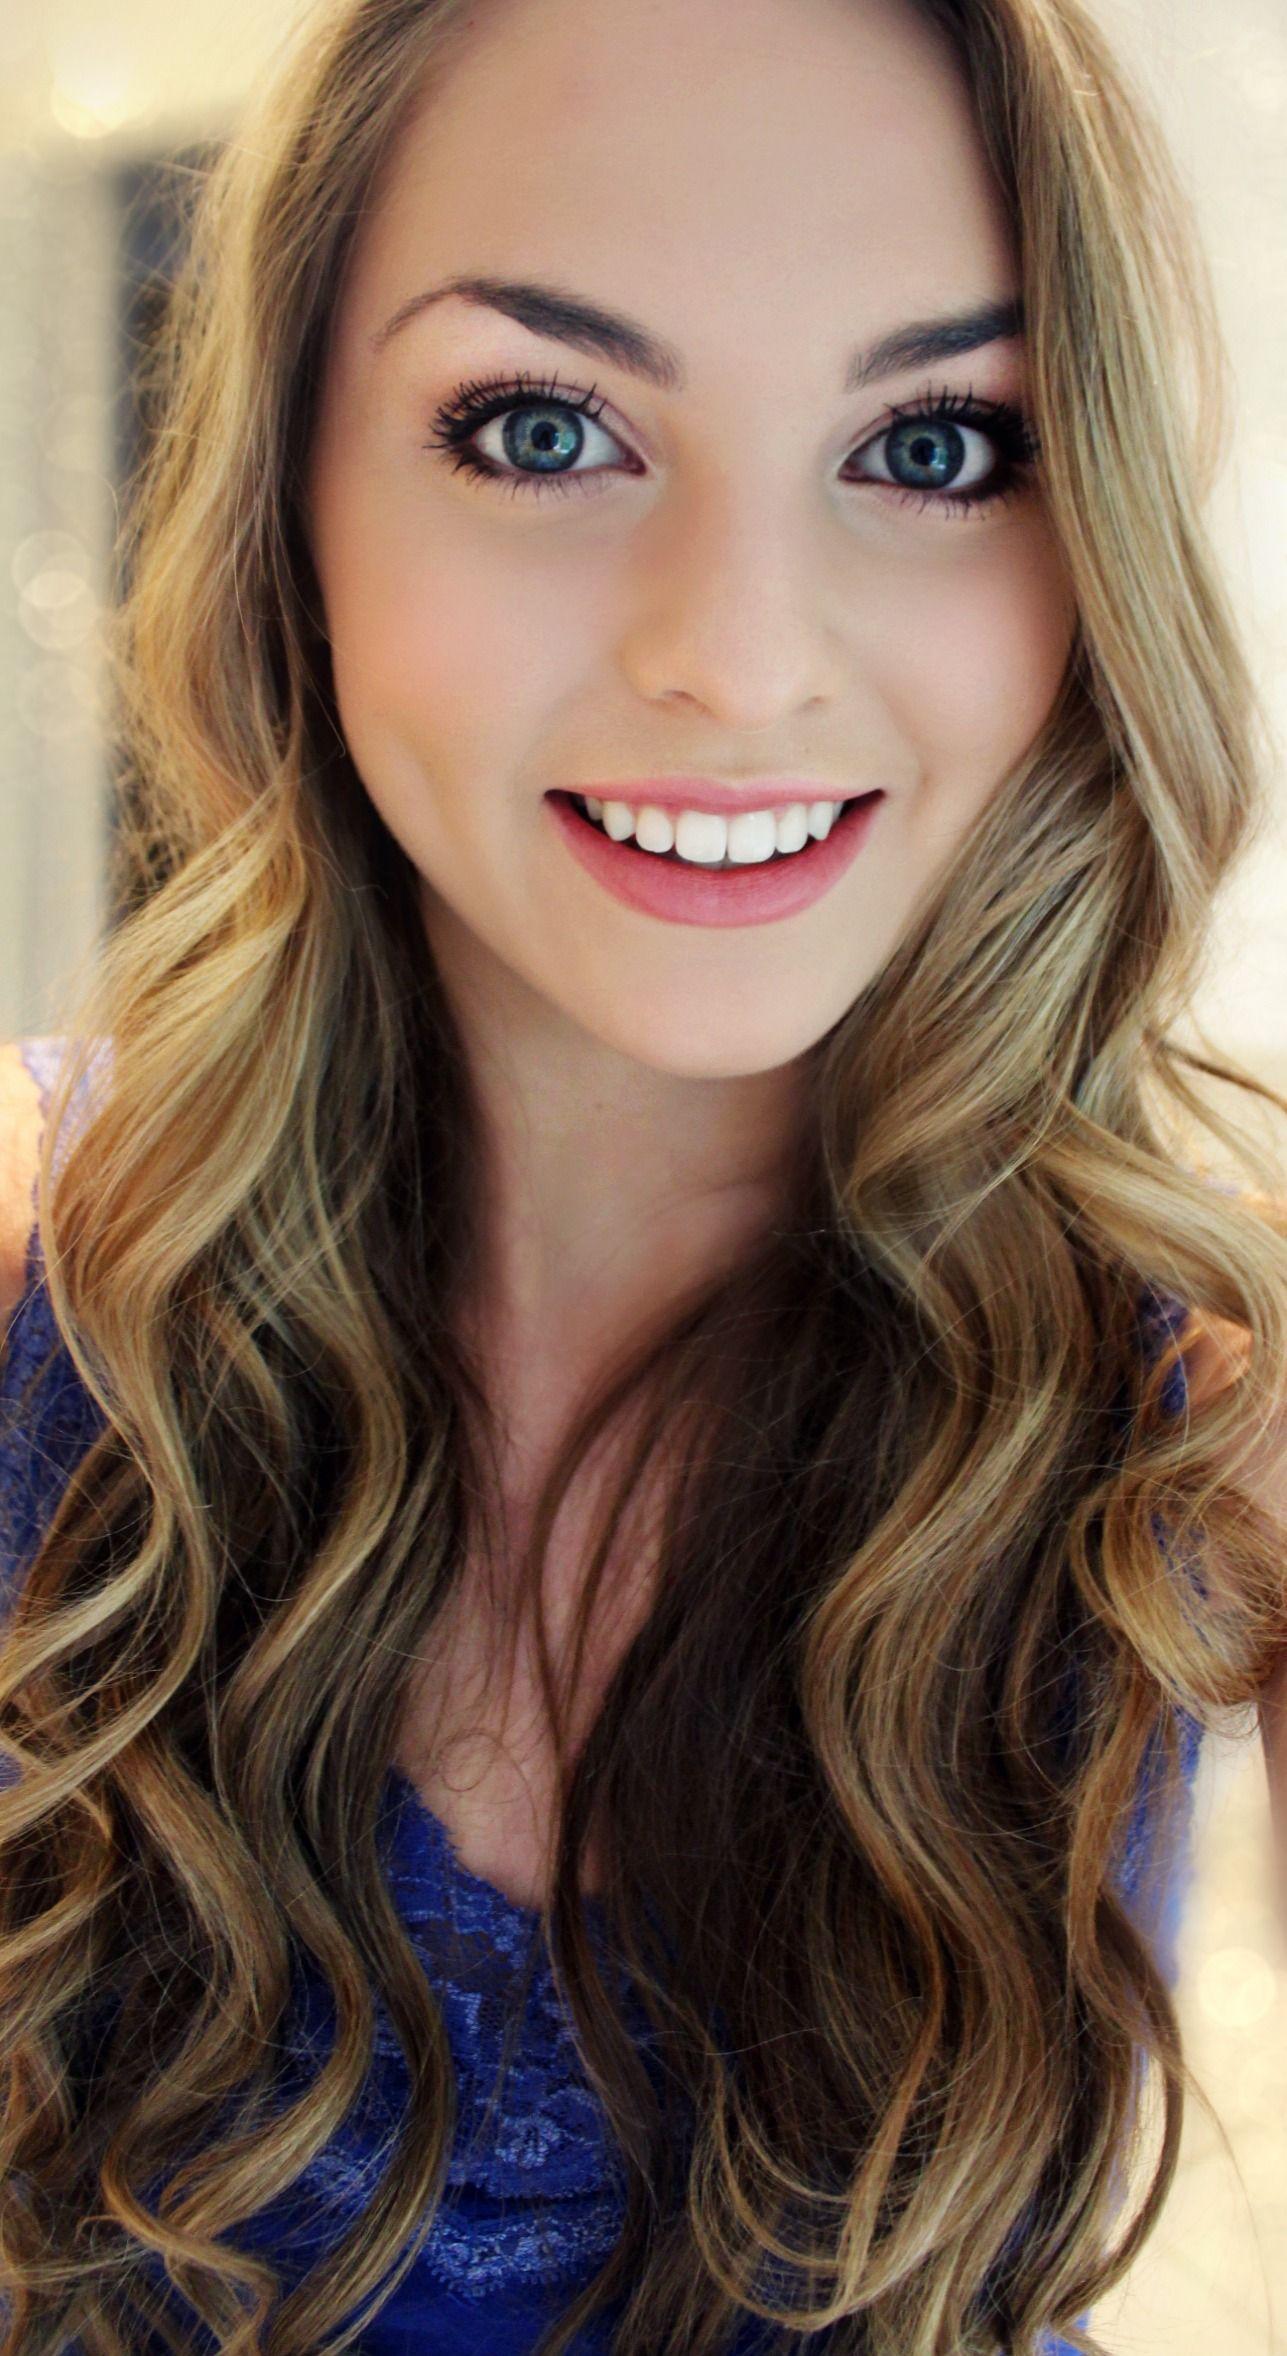 7th Grade natural Makeup look! Middle School Makeup series